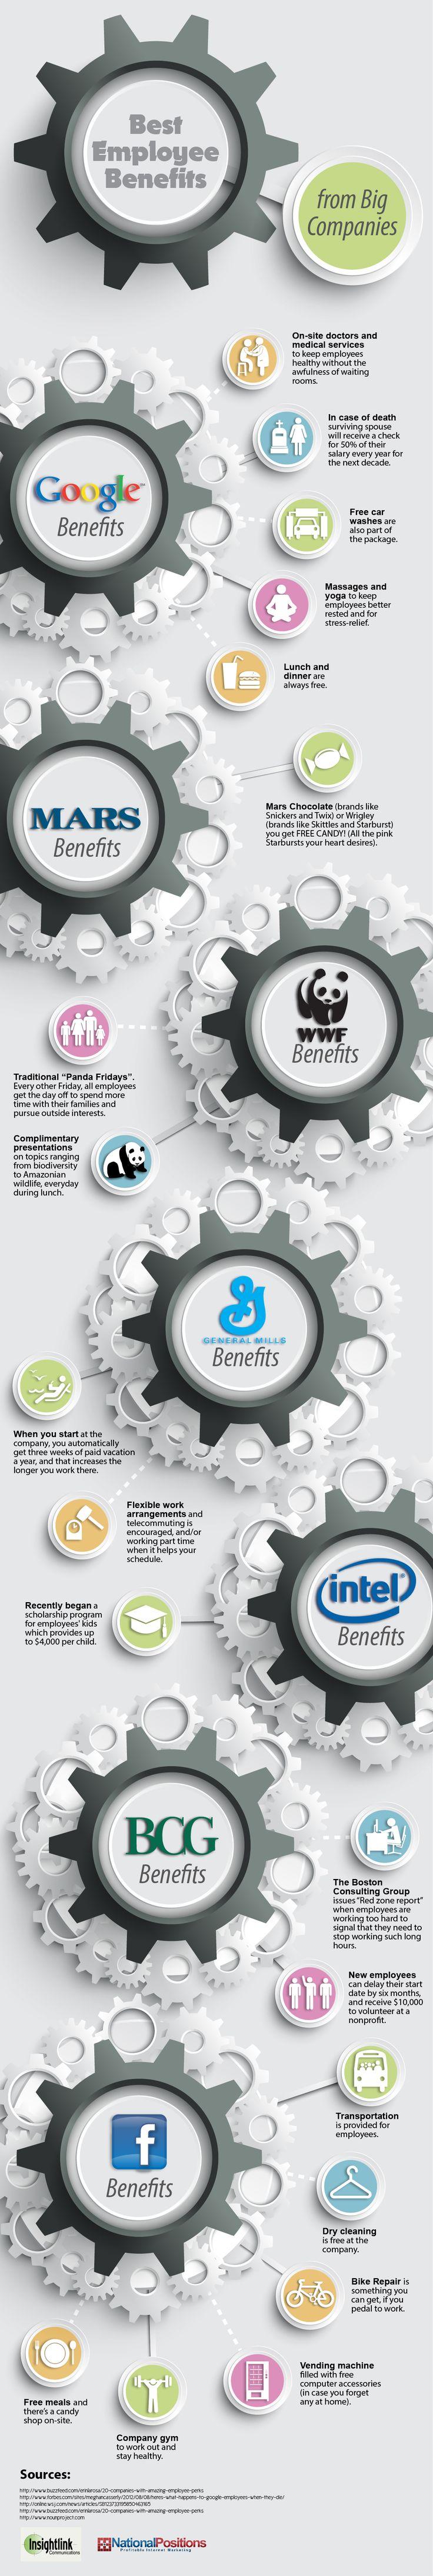 Best Employee Benefits From Big Companies   #infographic #EmployeeBenefits #BigCompanies